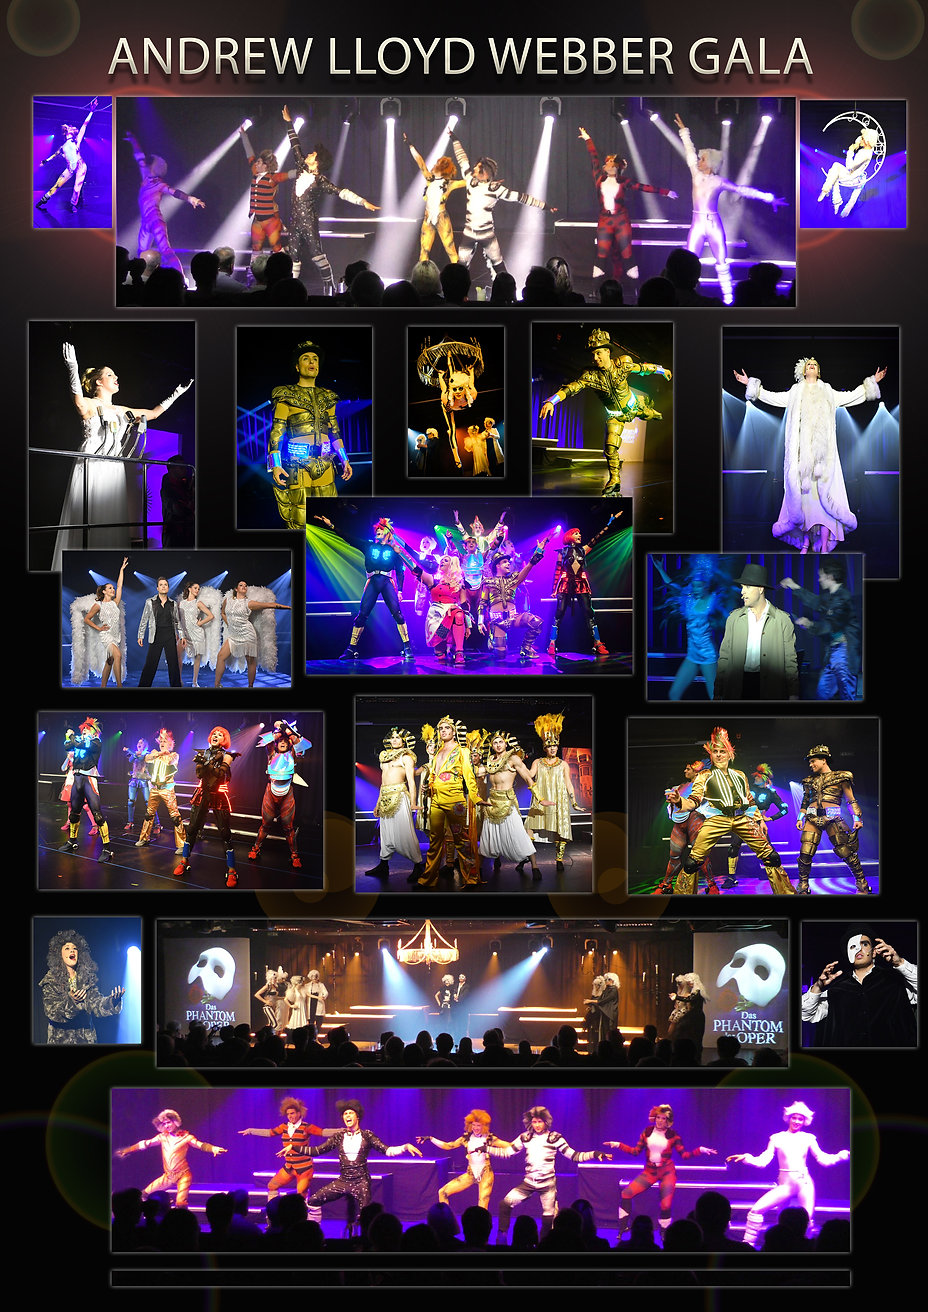 Andrew Lloyd Webber Gala Collage lang.jp